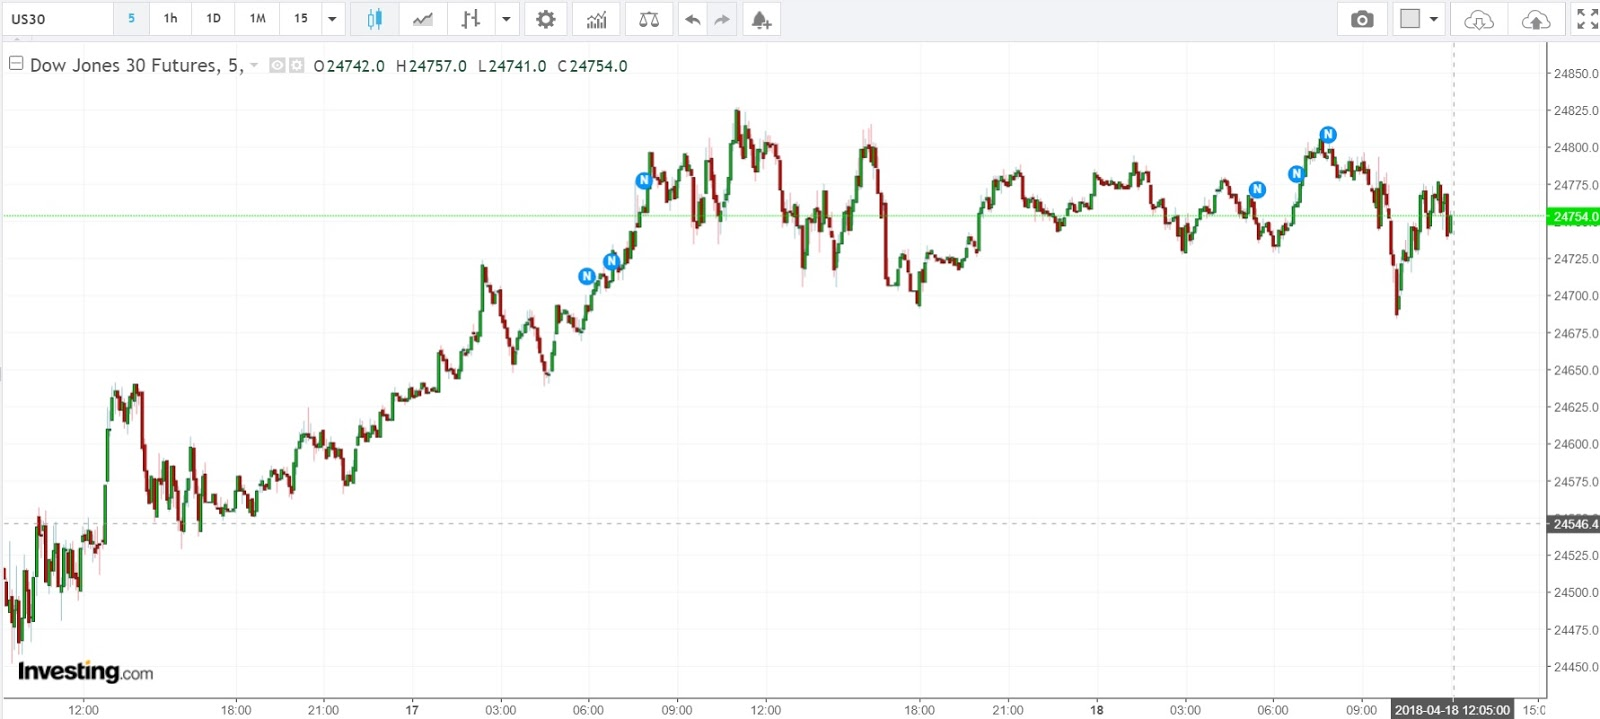 Stock Market Best-Kept Secrets: Dow Jones - LIVE Trading with Ronald K